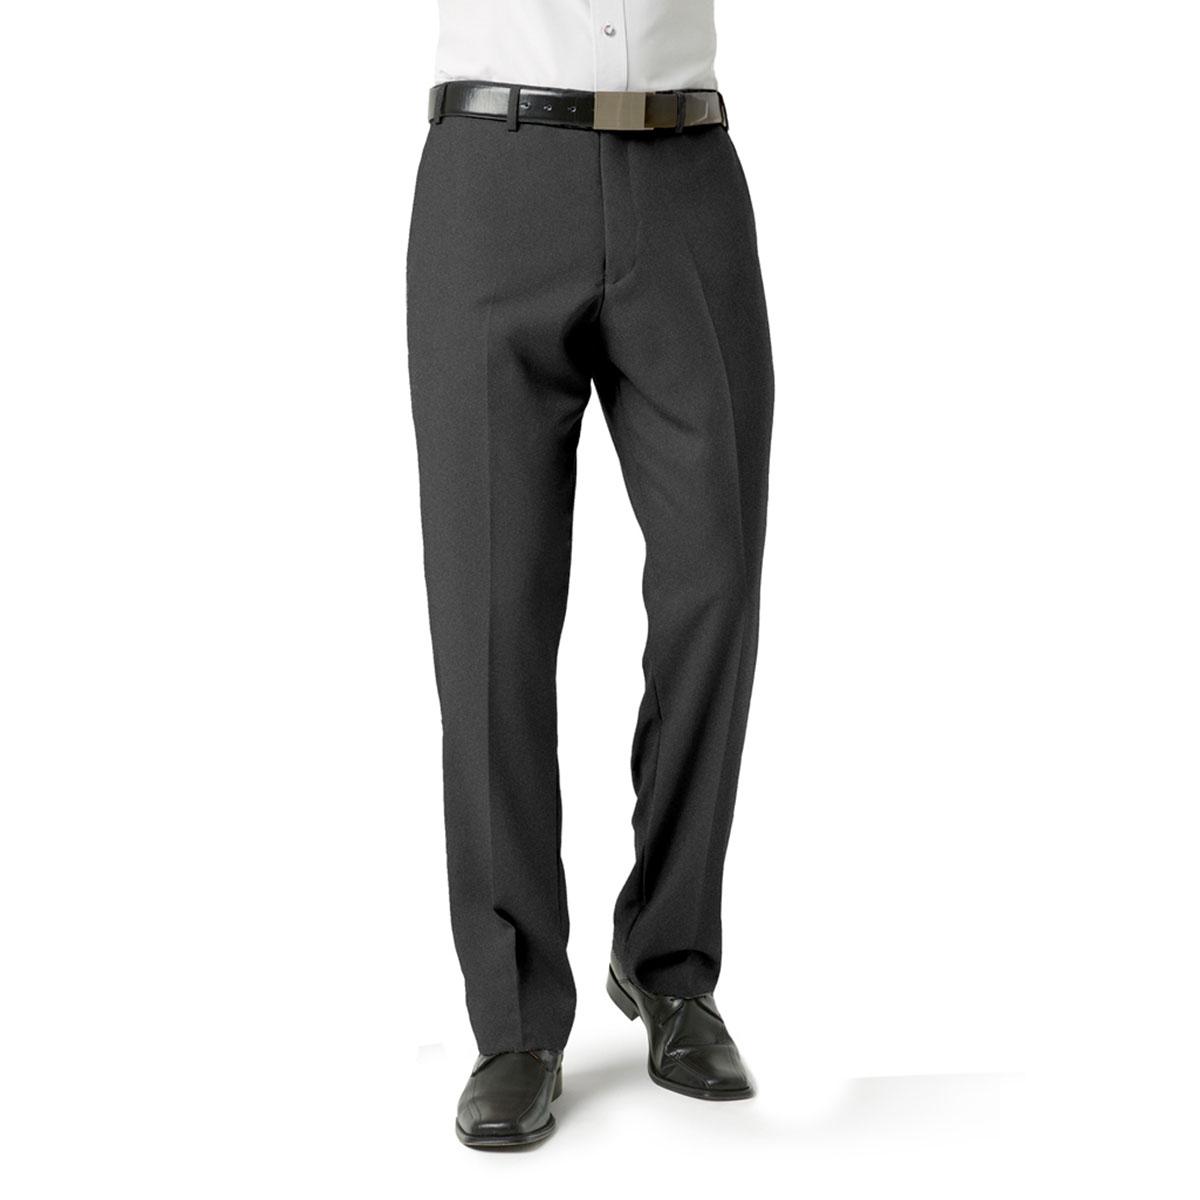 Mens Classic Flat Front Pant-Charcoal